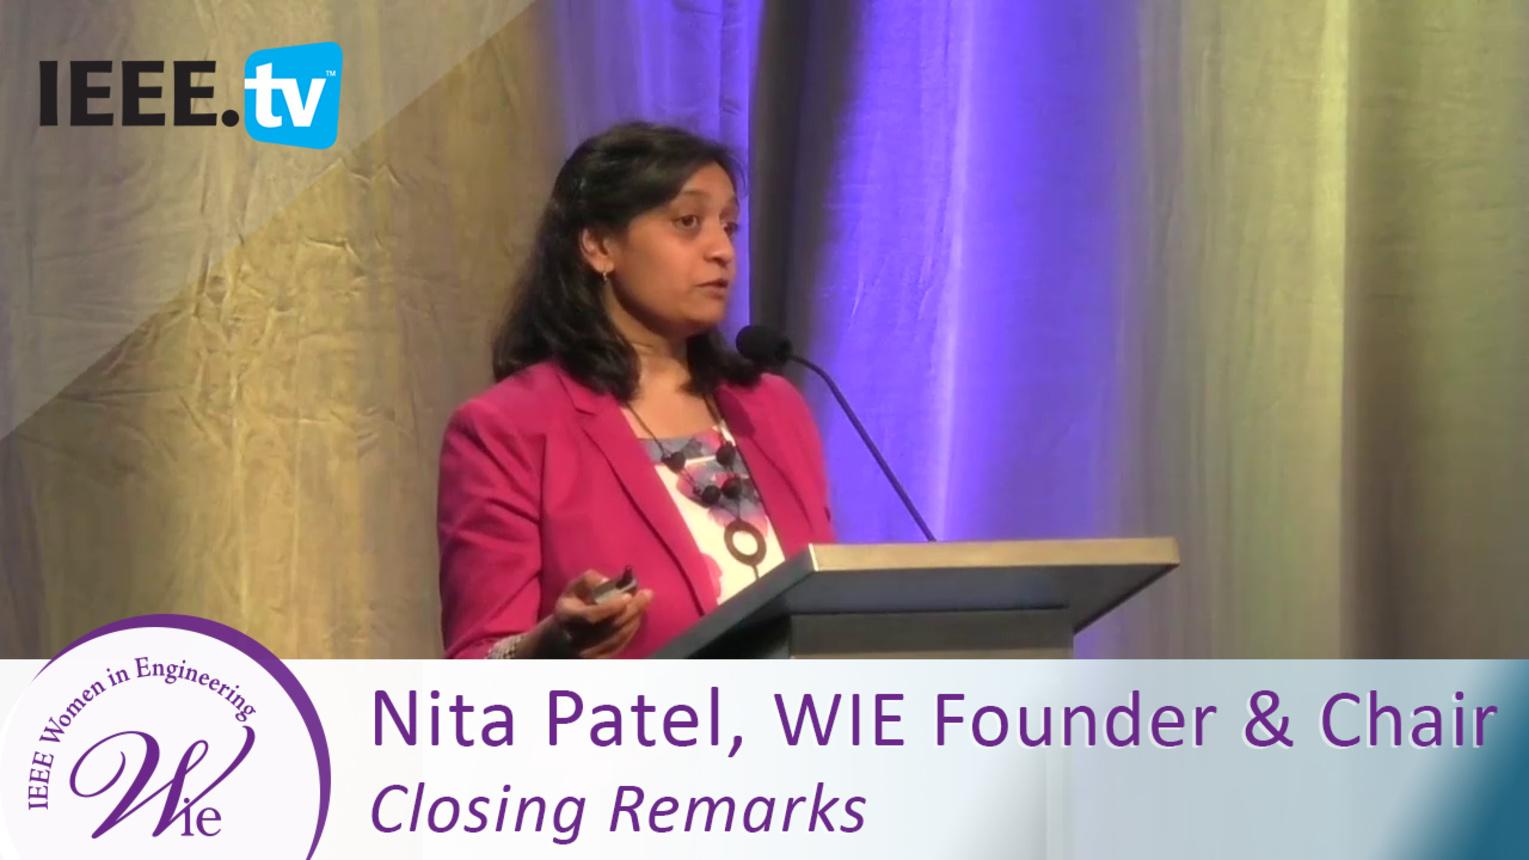 Nita Patel Closing Remarks - 2016 Women in Engineering Conference